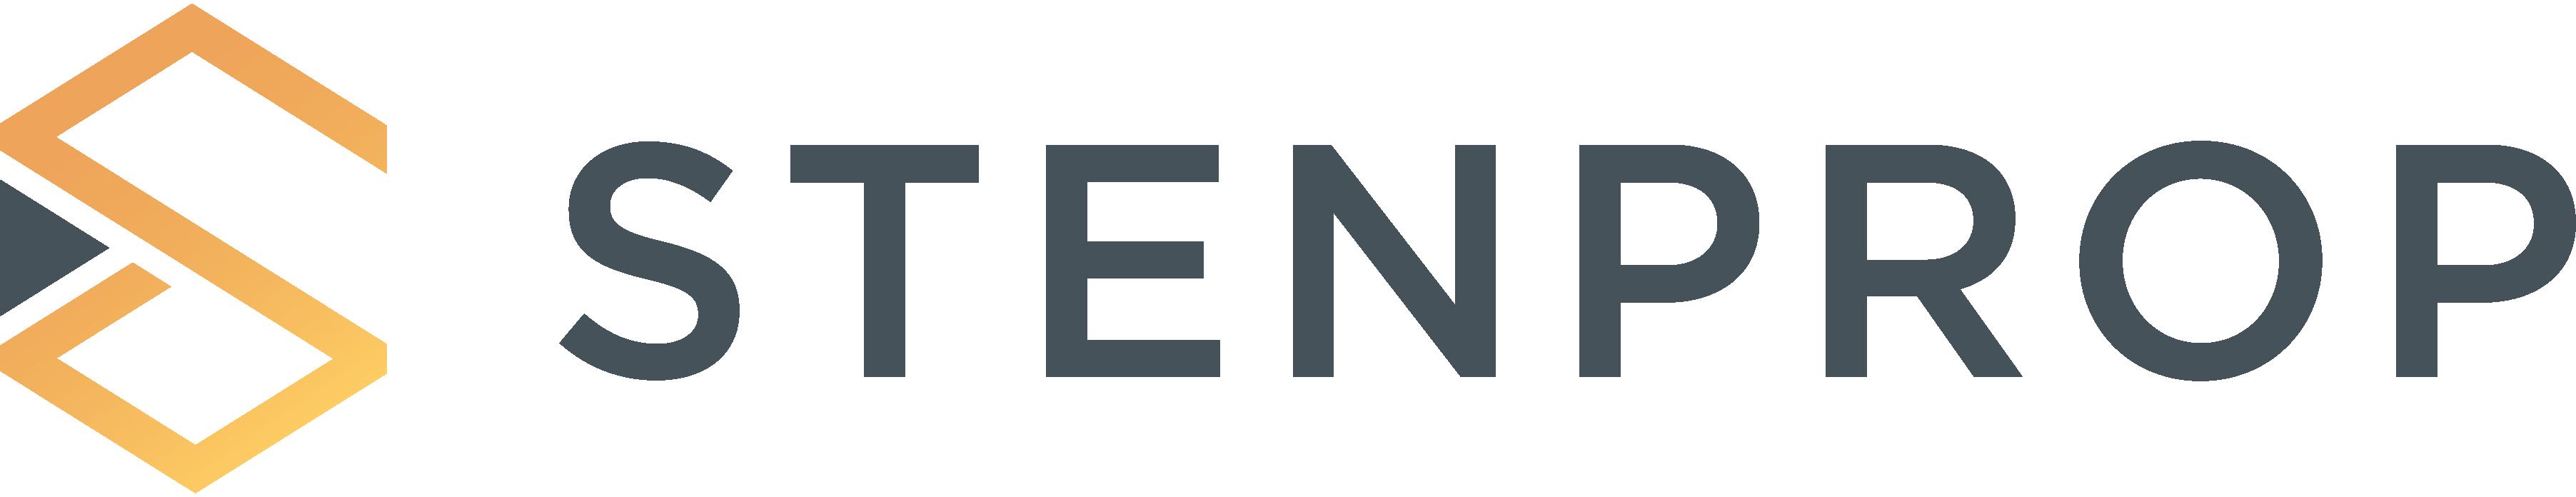 Stenprop Ltd (REIT) Logo